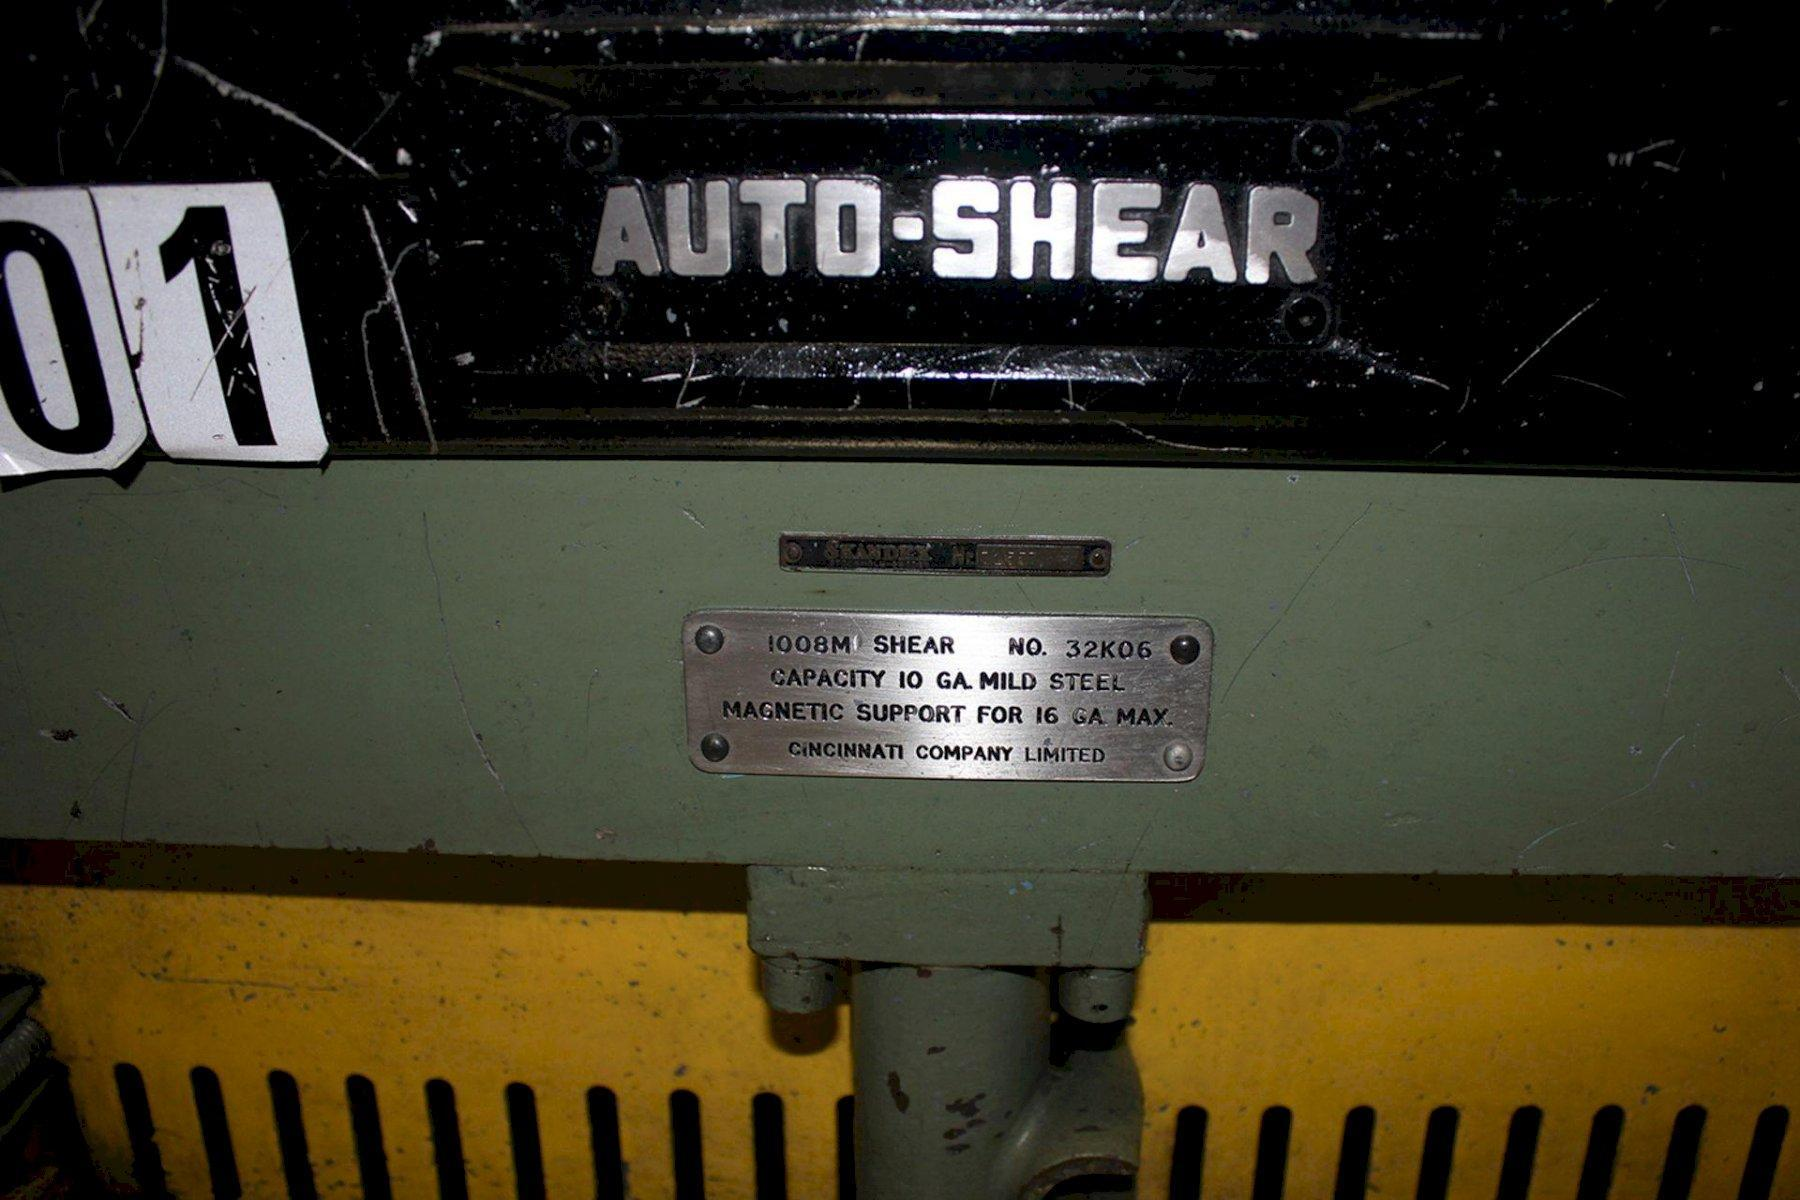 Cincinnati Power Shear 10 Ga. x 8' #5907